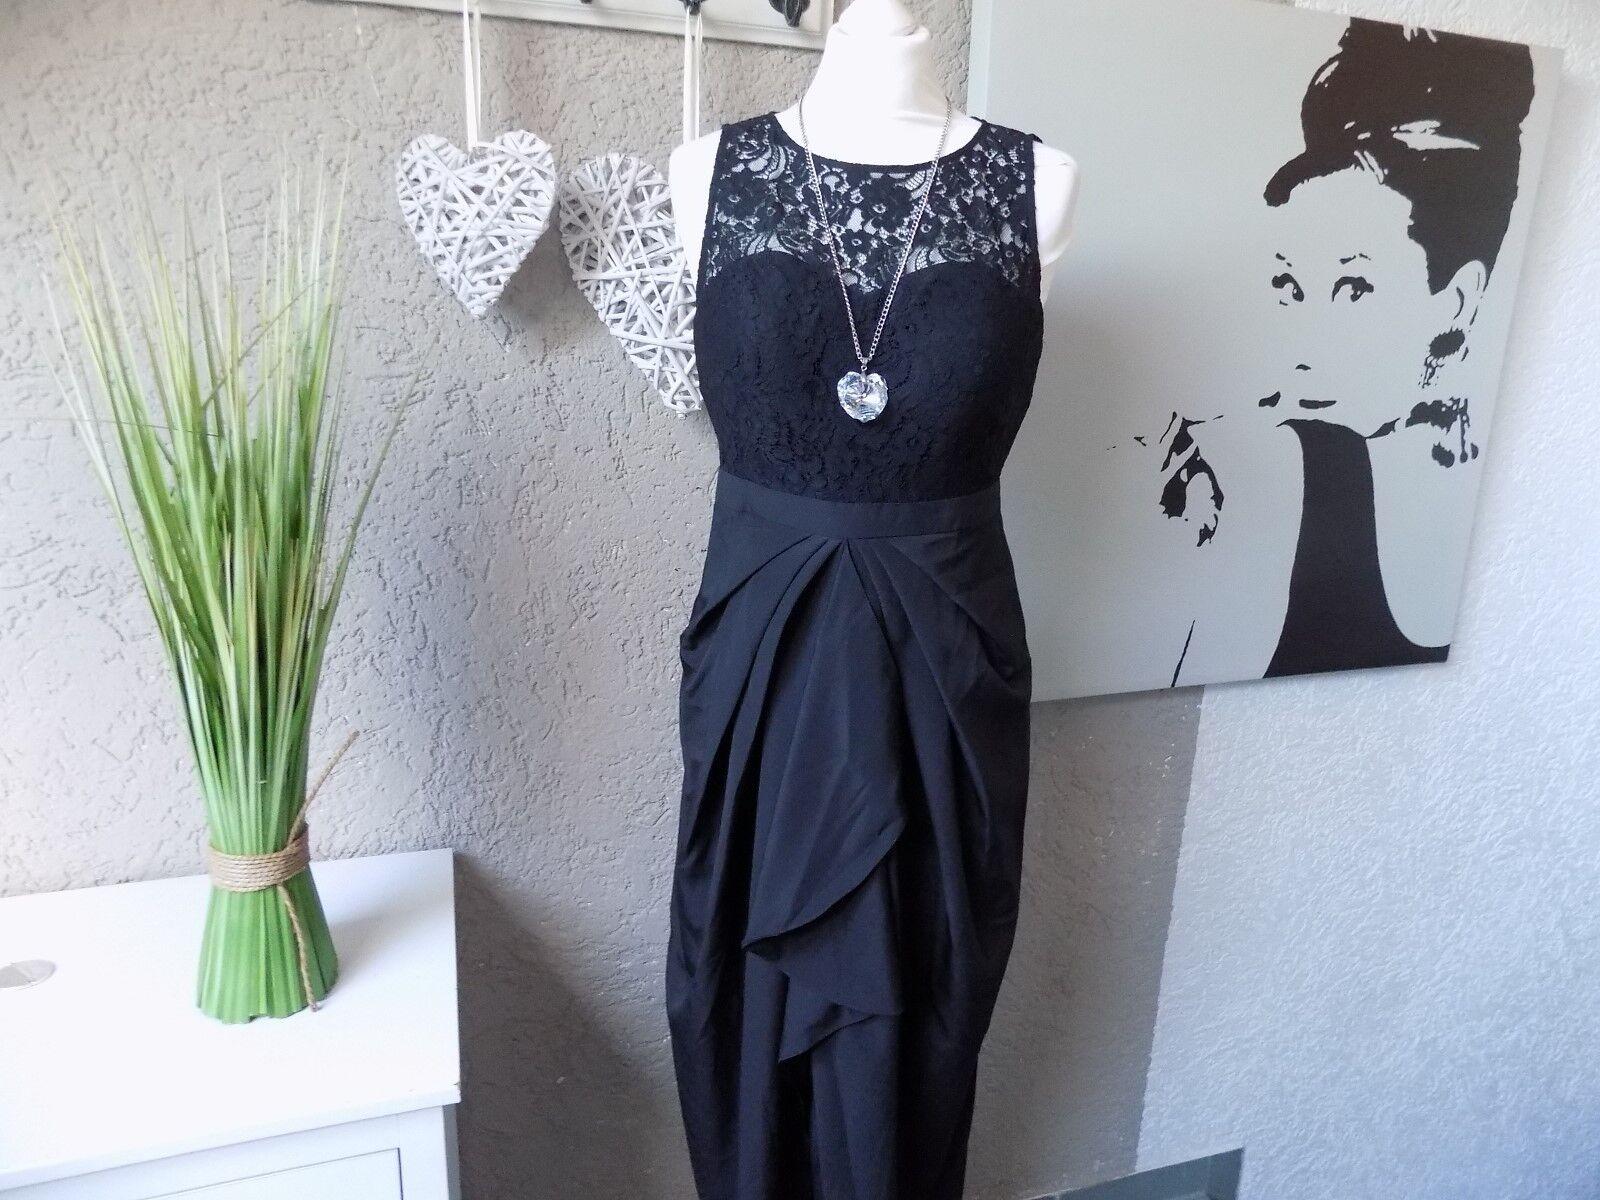 996ea985f9bee Laura Scott Abendkleid edel Spitze black 38 (42d) Gr. Kleid nrwfgt17651- Dresses